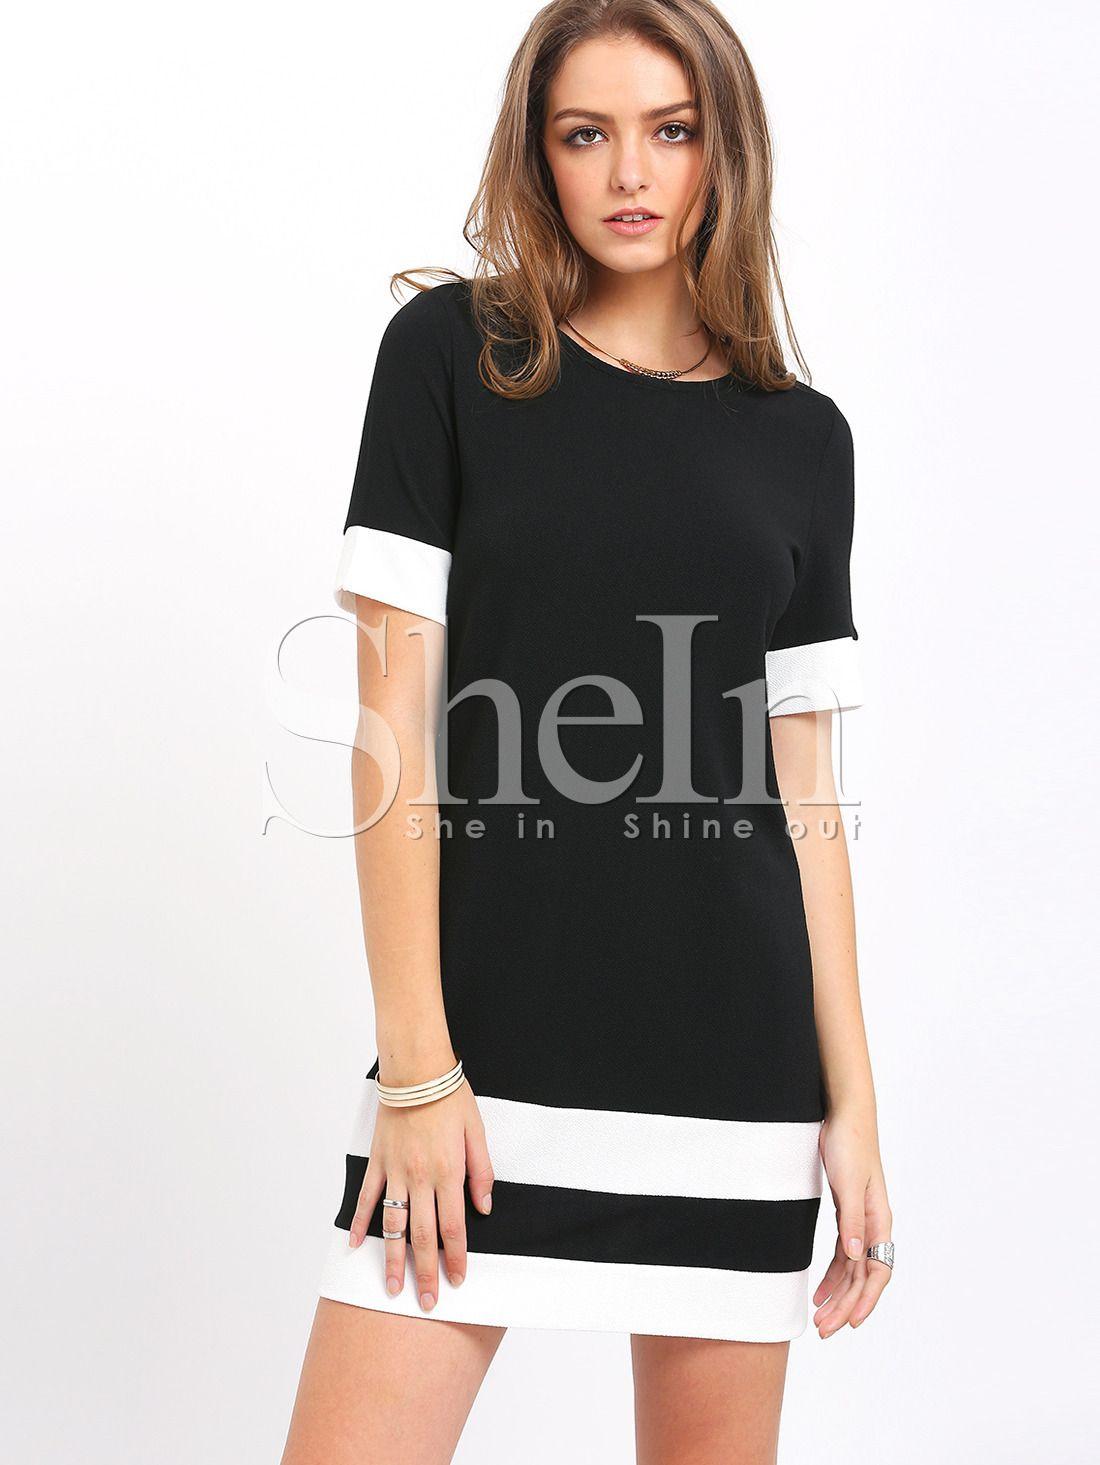 Color Block Stripe Shift Dress Short Sleeve Shift Dress Mini Dress Casual Striped Mini Dress [ 1465 x 1100 Pixel ]